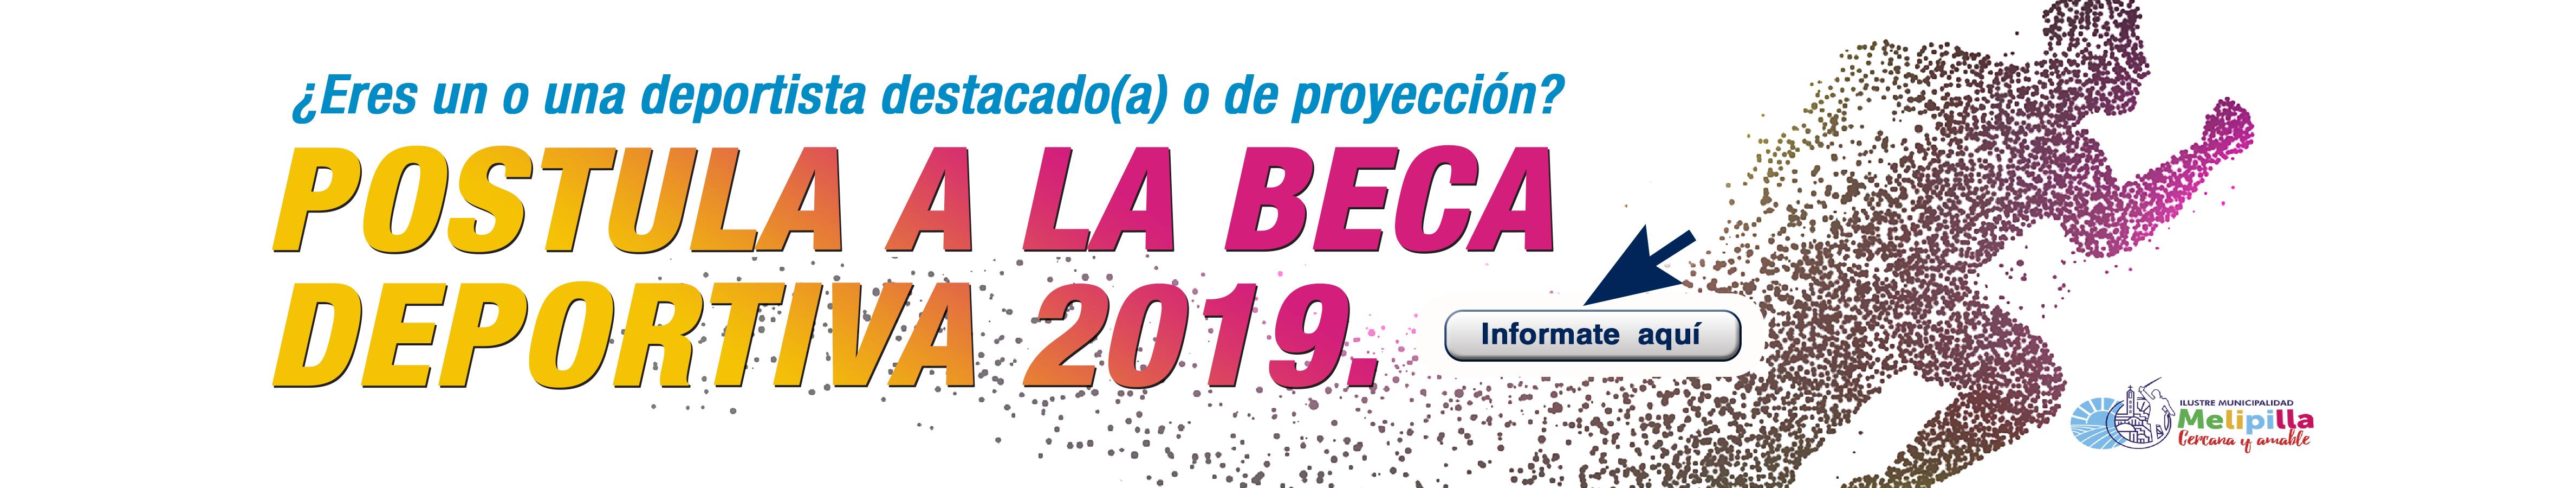 slider-beca-deportiva-2019